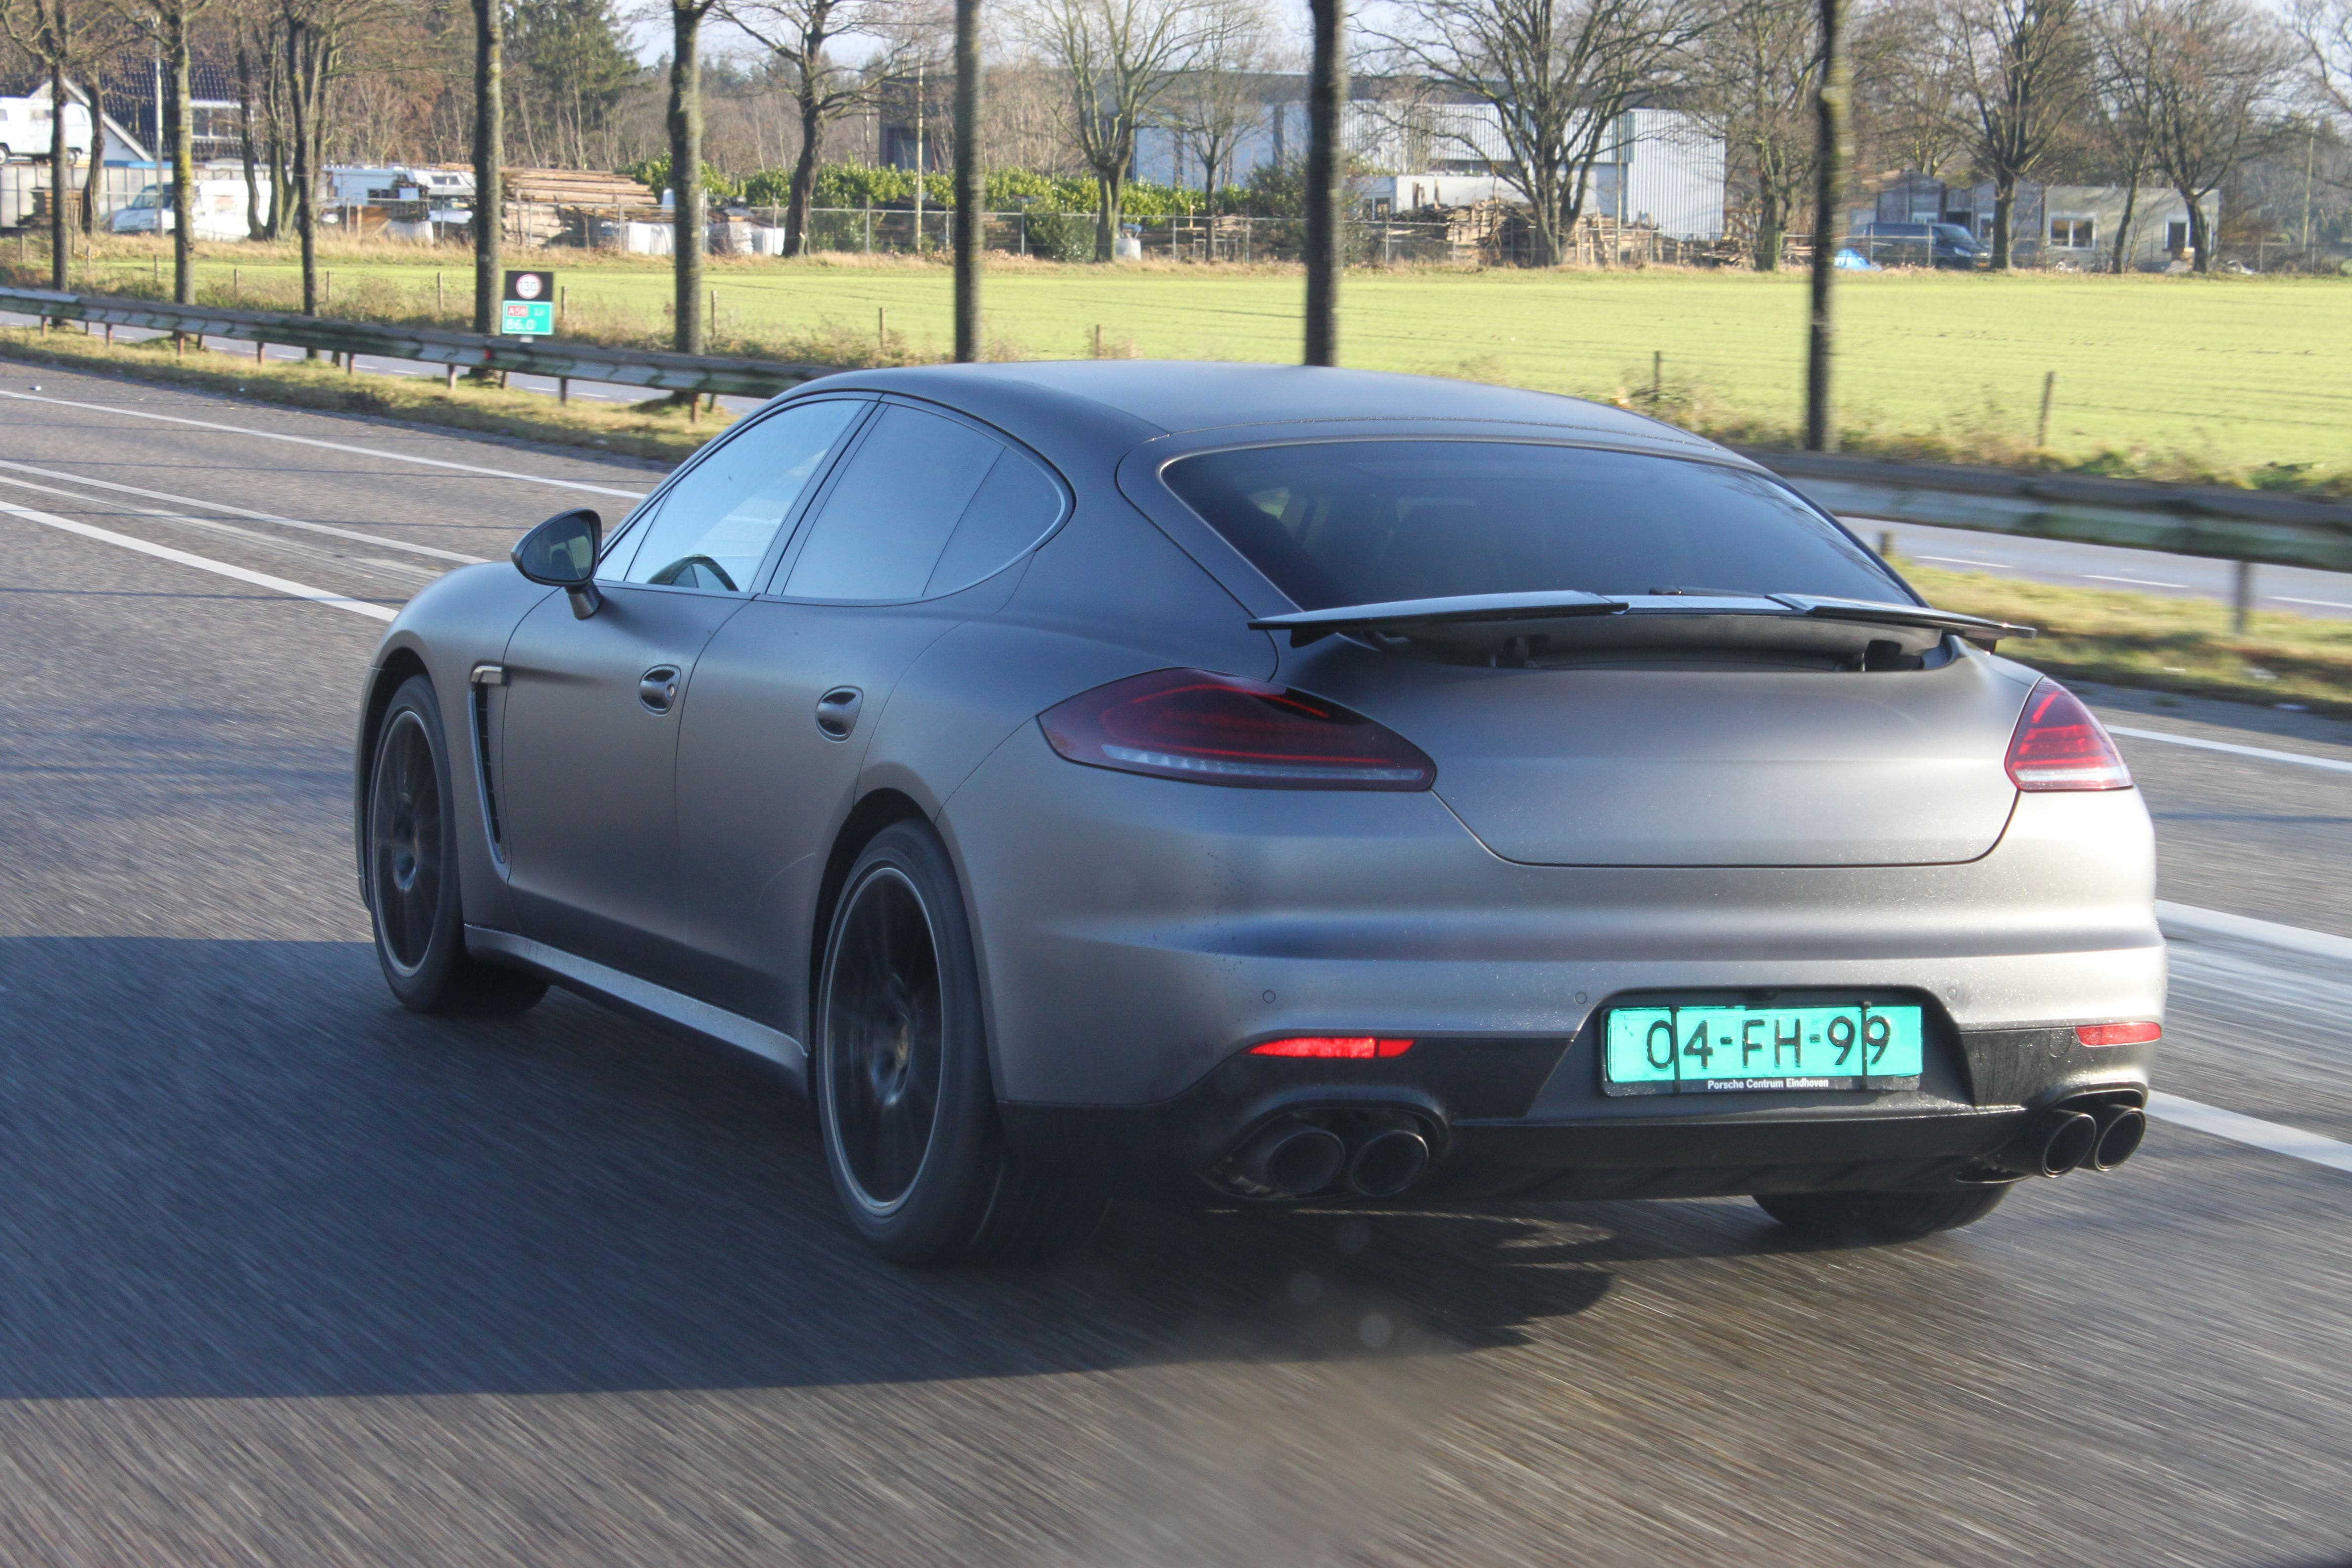 Porsche Panamera GTS Full Wrap in Gunpowder, Carwrapping door Wrapmyride.nu Foto-nr:7127, ©2021